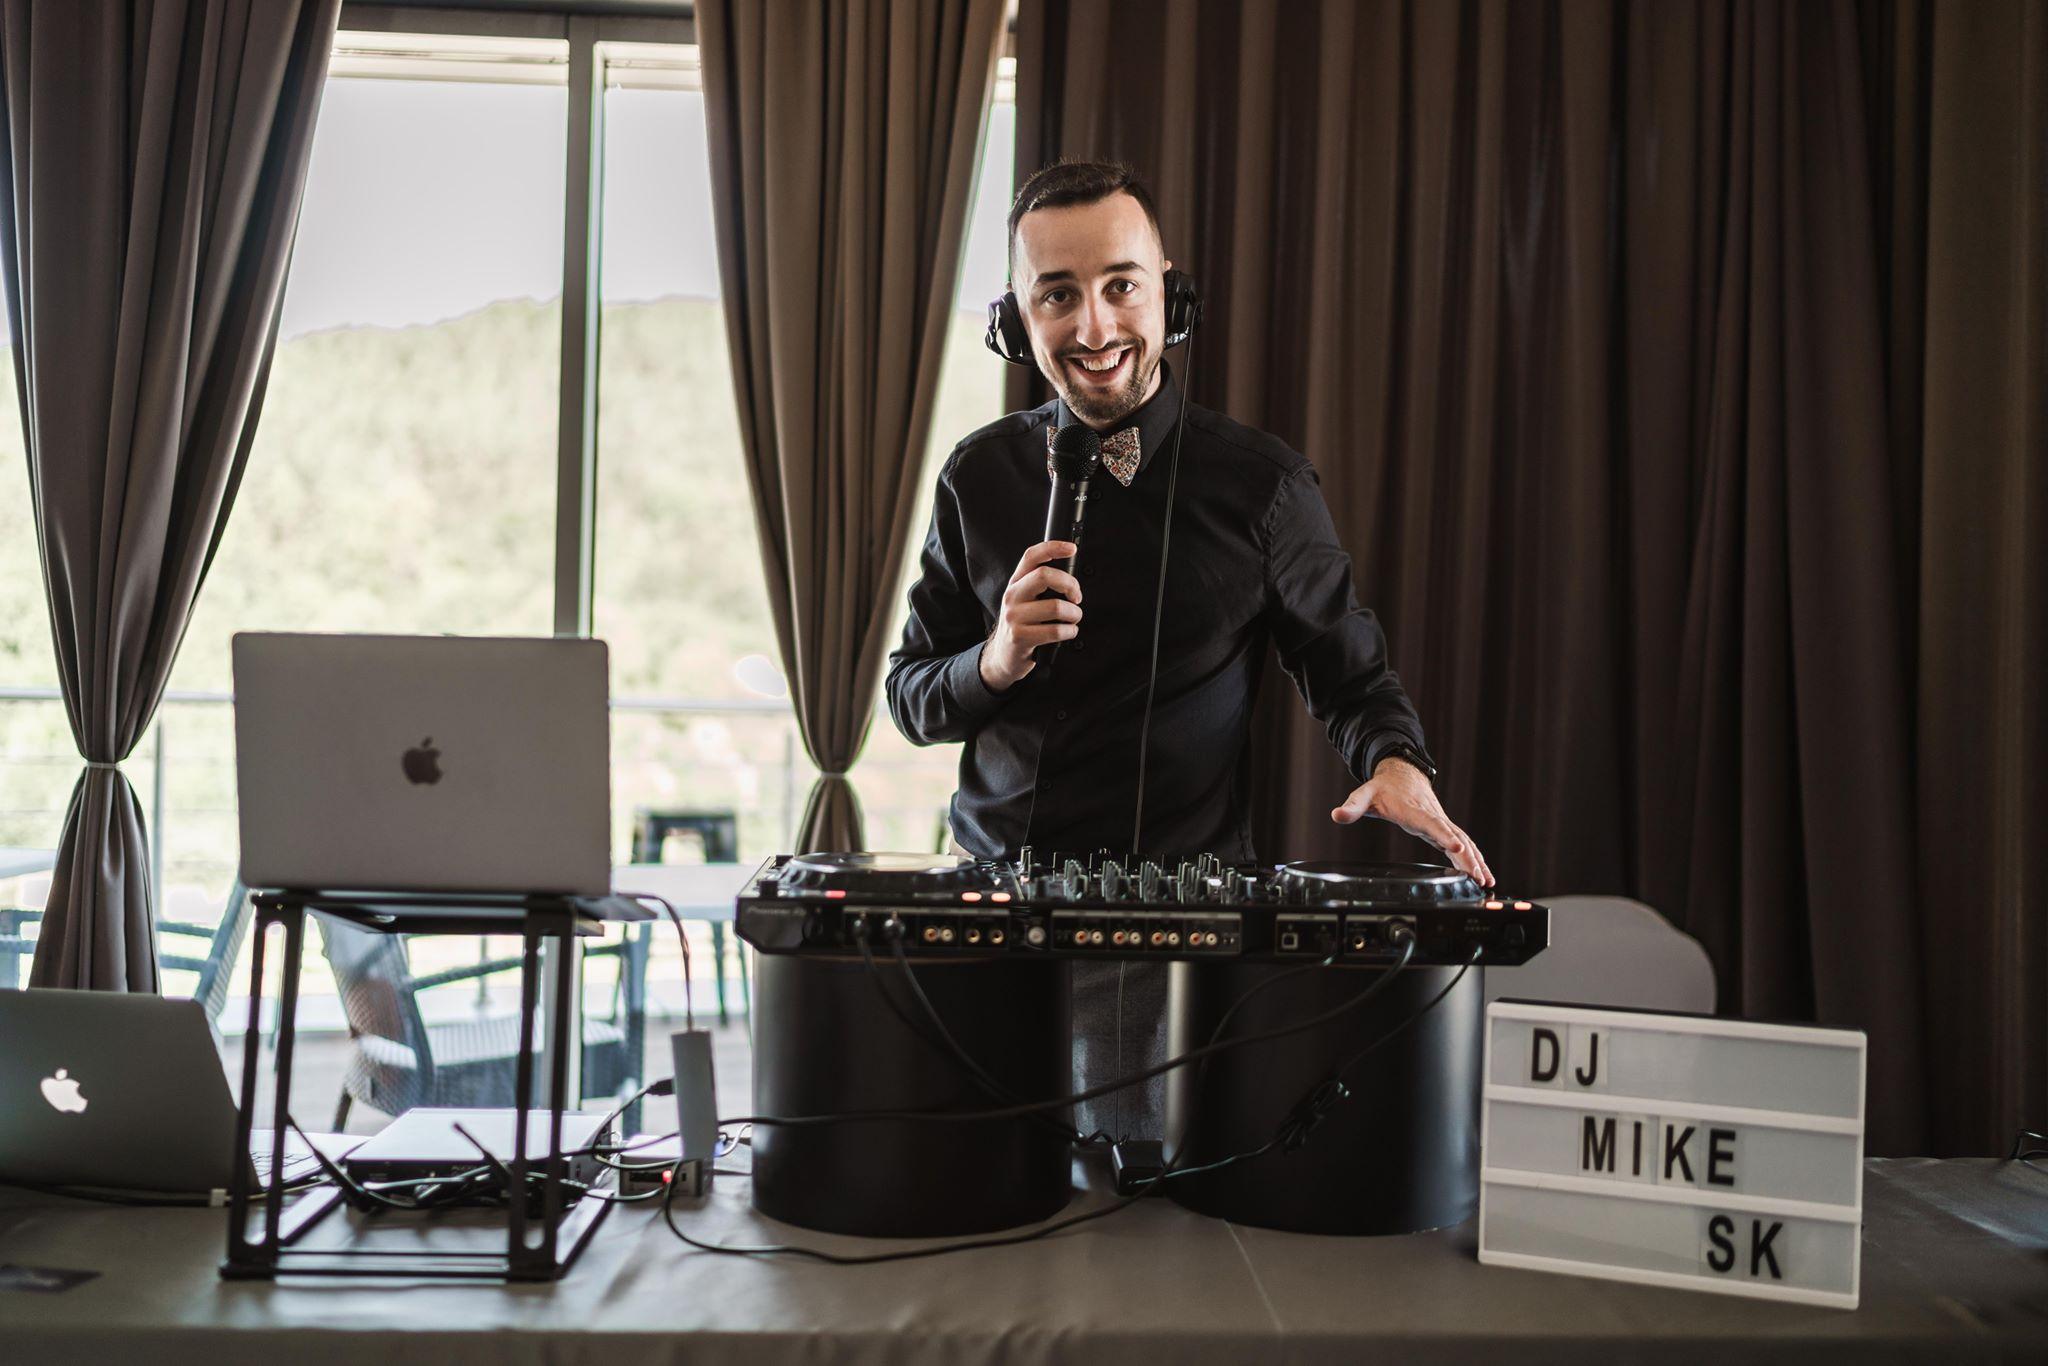 DJ-Starejsi-Moderator-Zabavac-Umelec-Kapelajpg